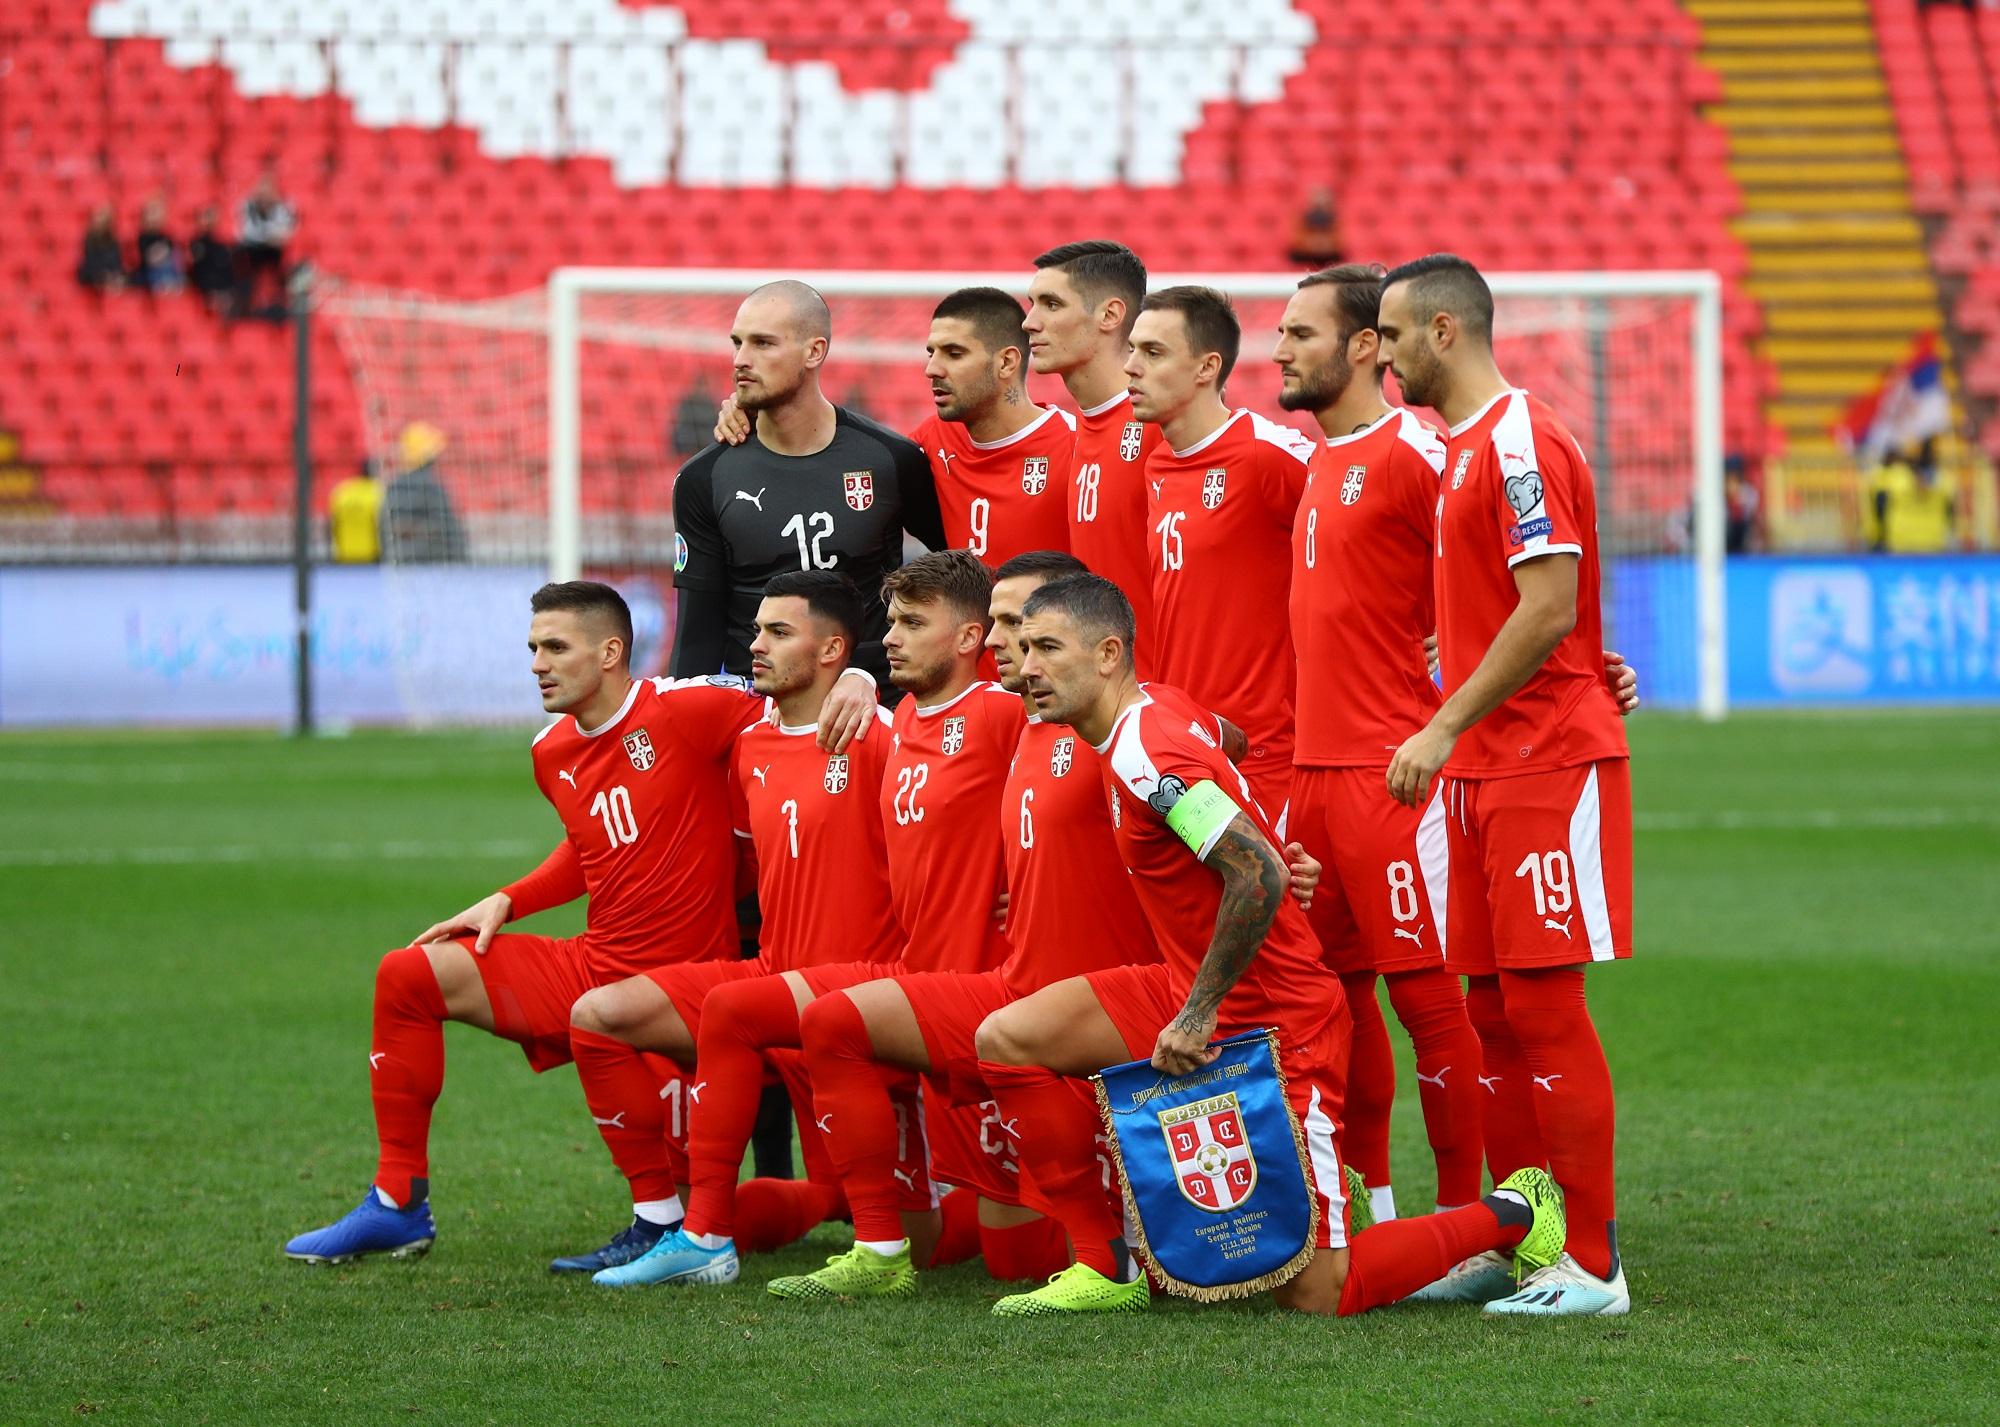 Soccer Football - Euro 2020 Qualifier - Group B - Serbia v Ukraine - Rajko Mitic Stadium, Belgrade, Serbia - November 17, 2019   Serbia players pose for a team group photo before the match    REUTERS/Marko Djurica